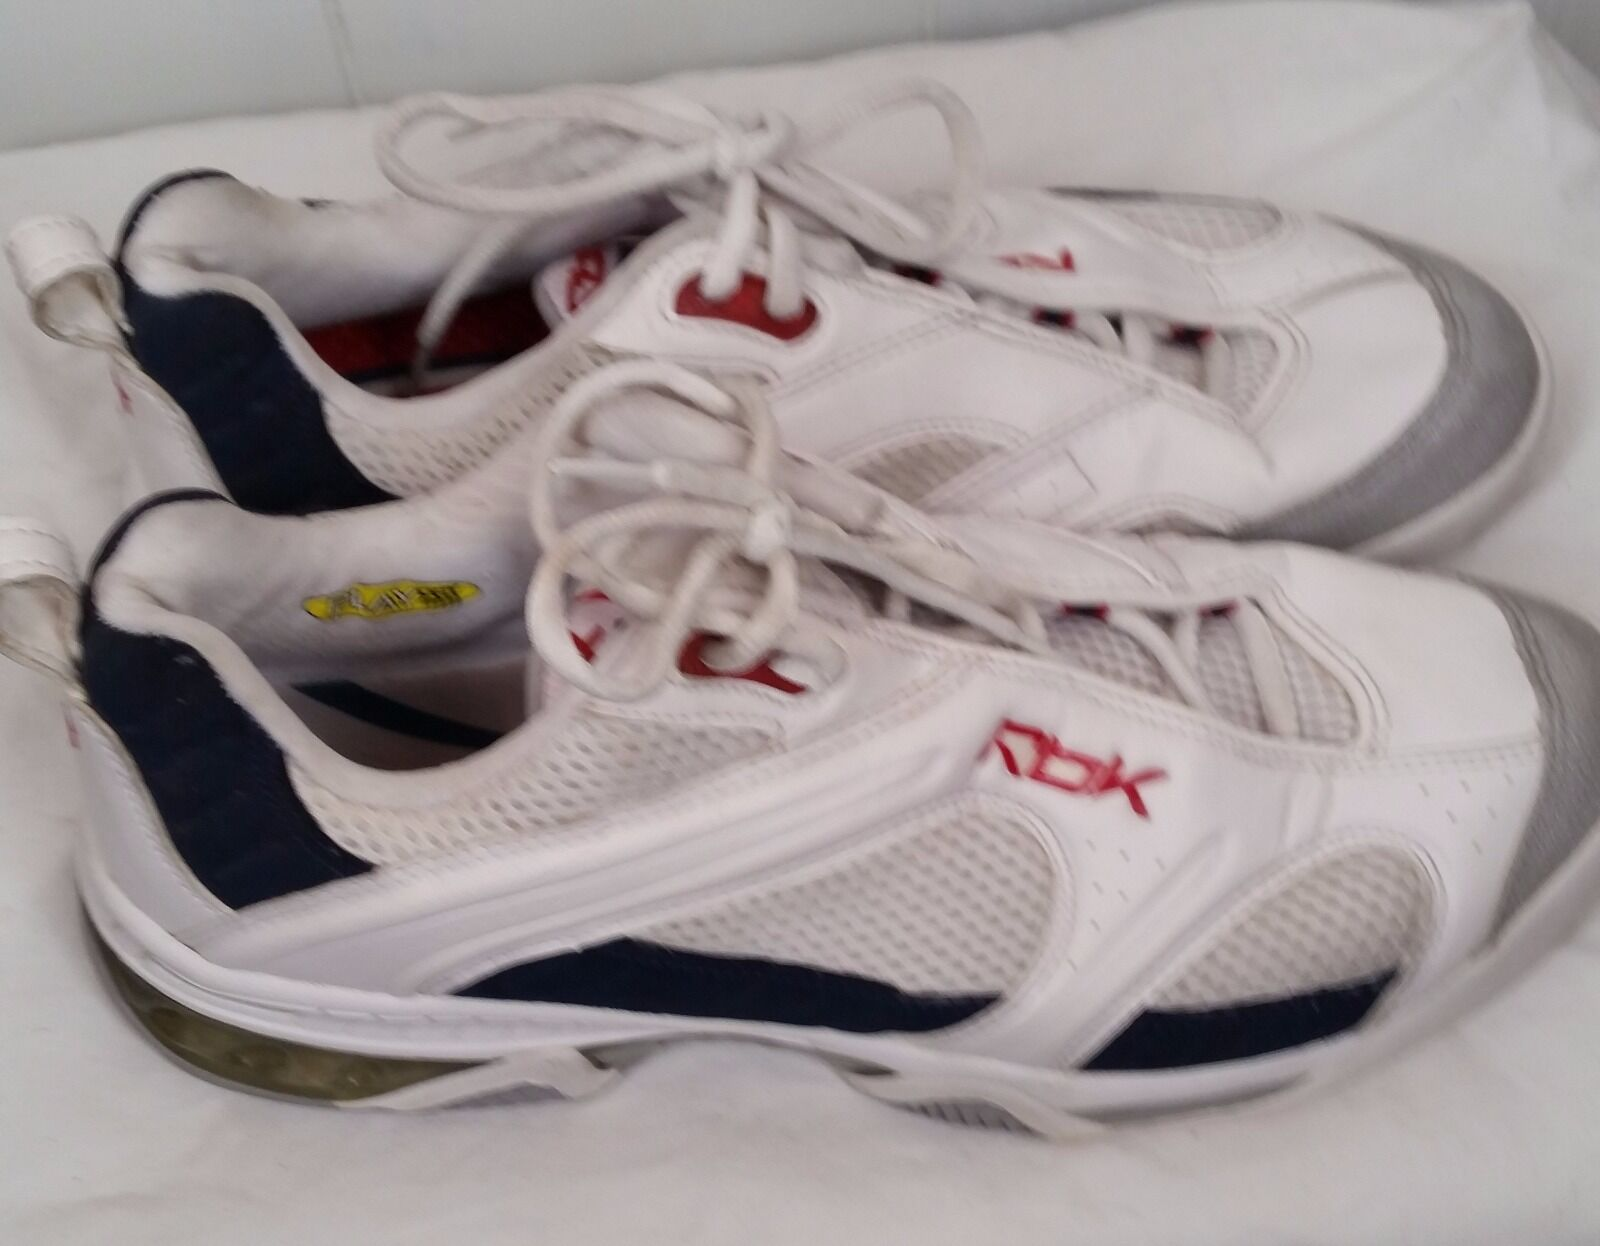 Reebok white bluee red premier Tennis shoes dmx shear  sneakers mens size 11.5